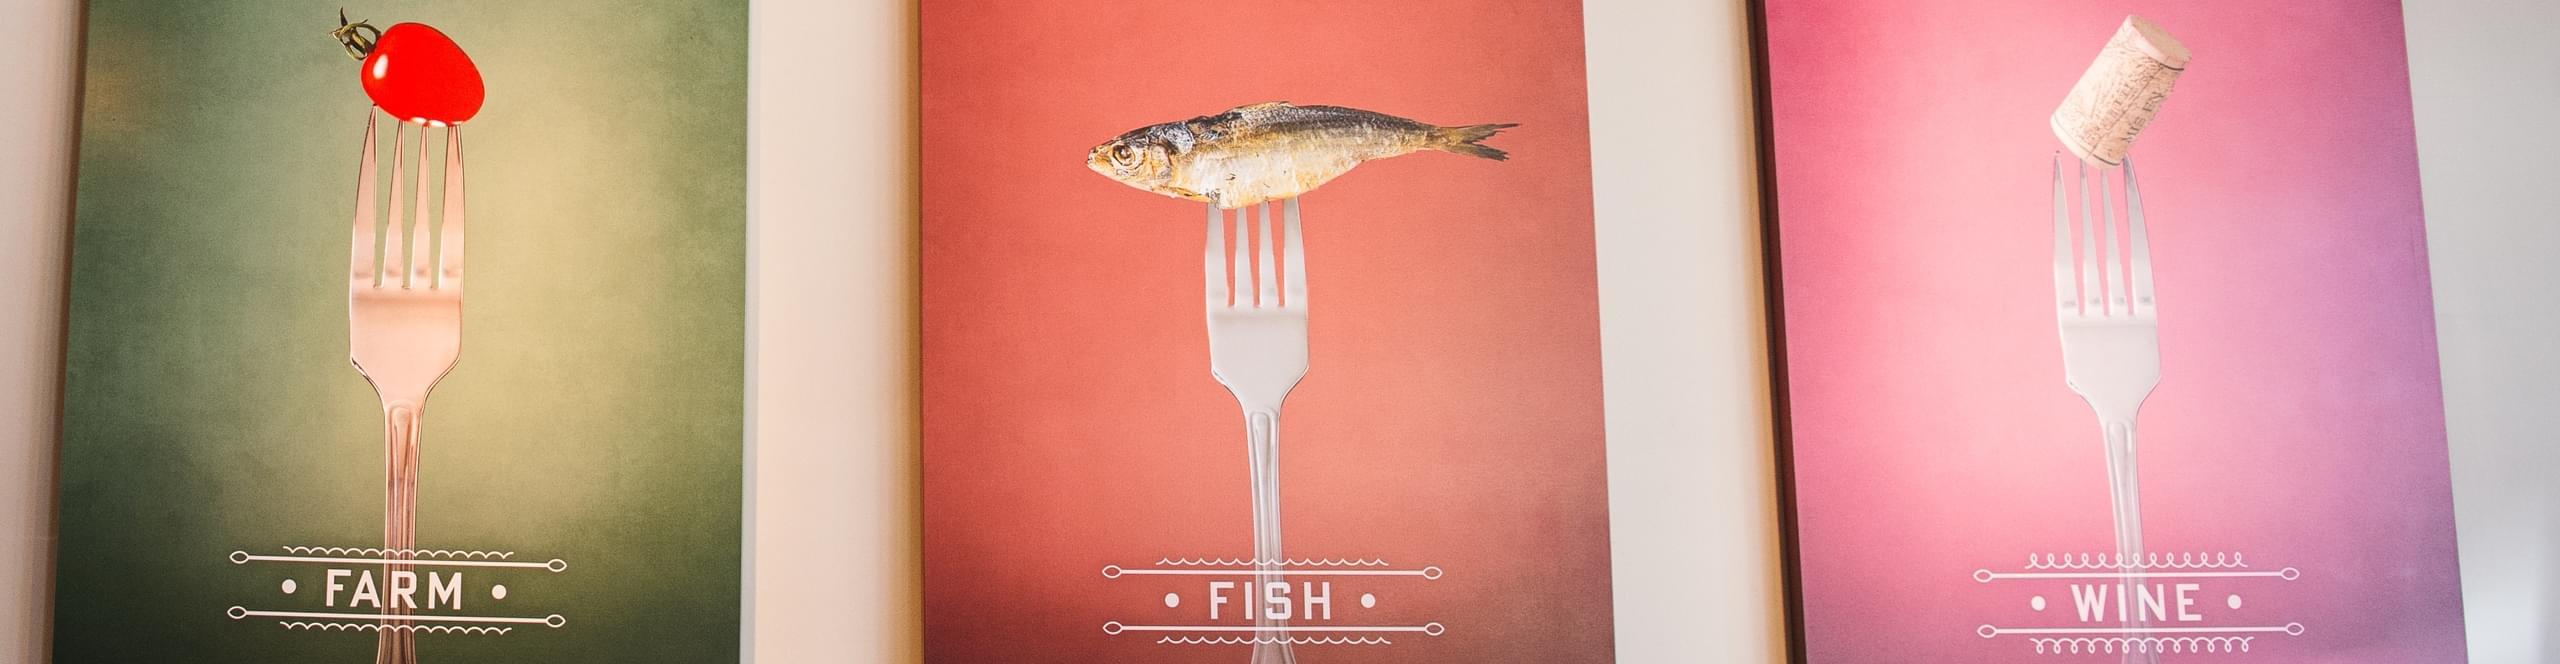 Image for Food & Drink